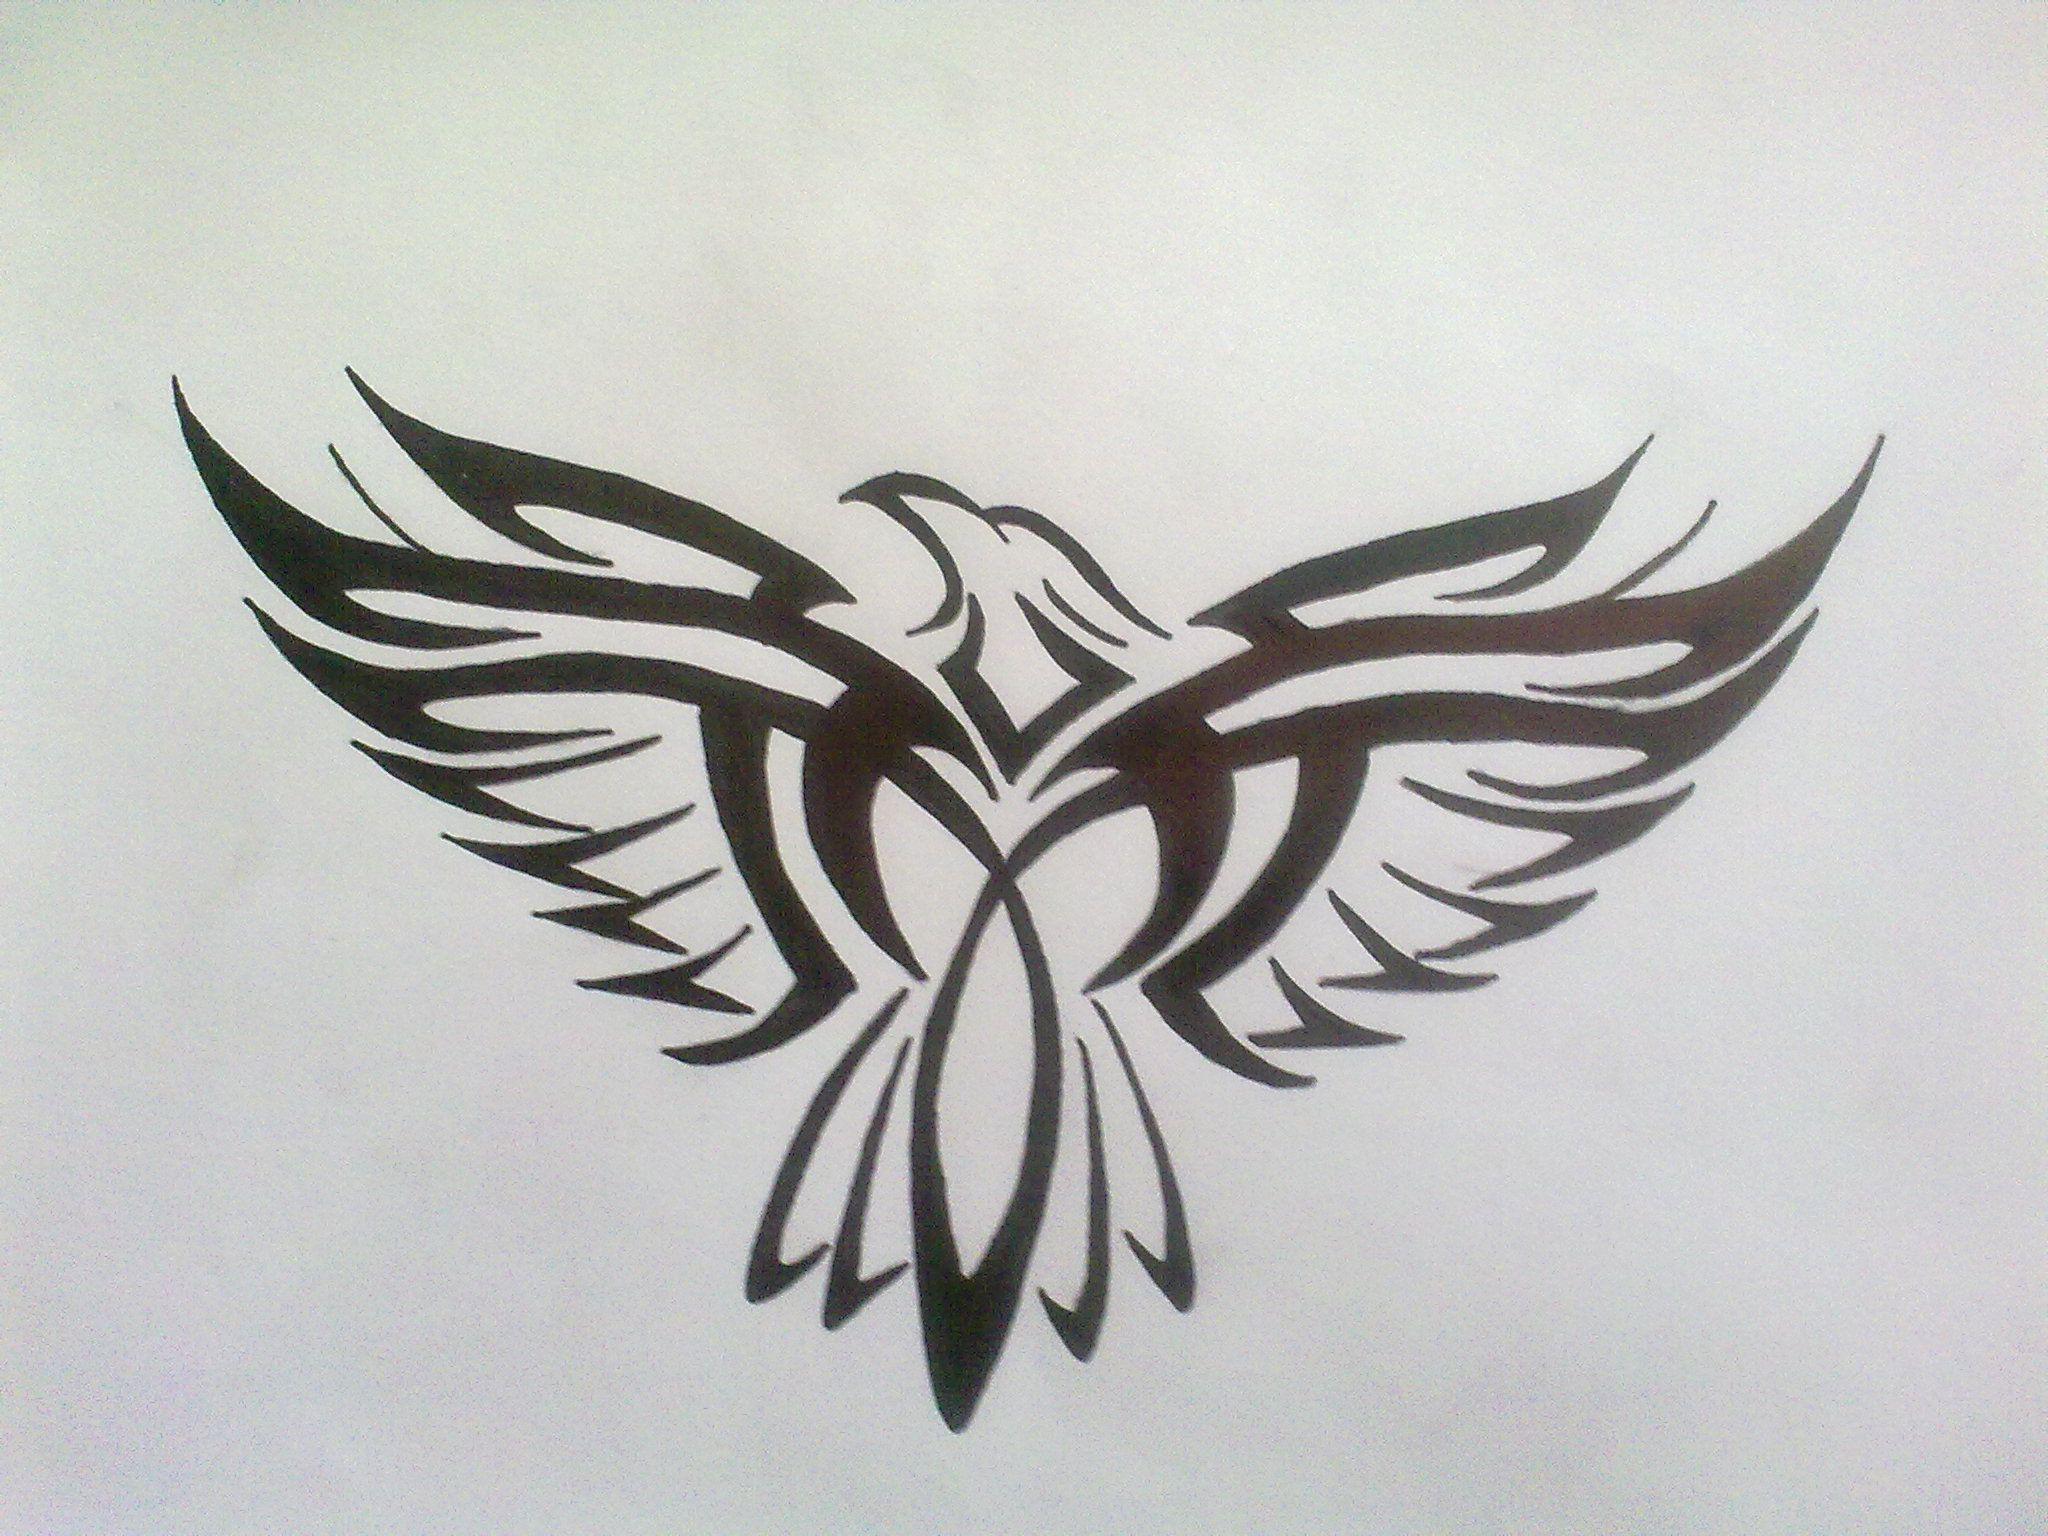 Tribal Eagle Tattoo By Bogi90 On Deviantart Tribal Eagle Tattoo Eagle Tattoo Tribal Tattoos